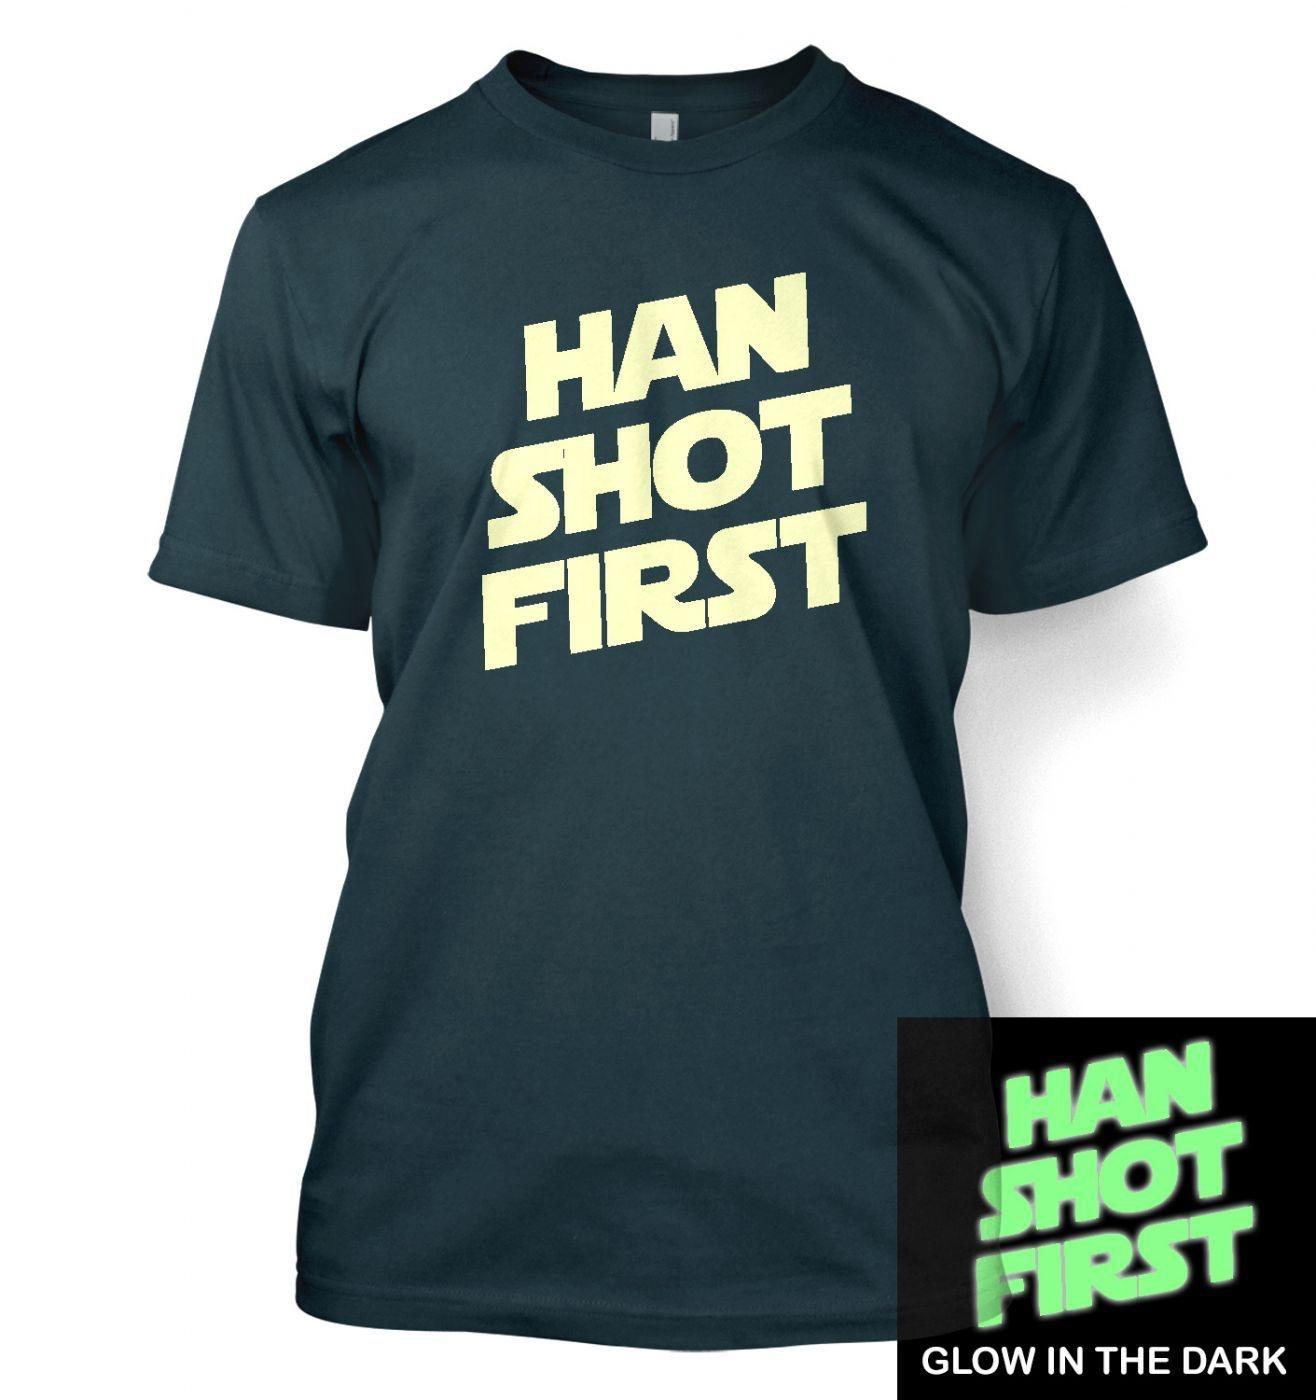 Han Shot First (glow in the dark) t-shirt